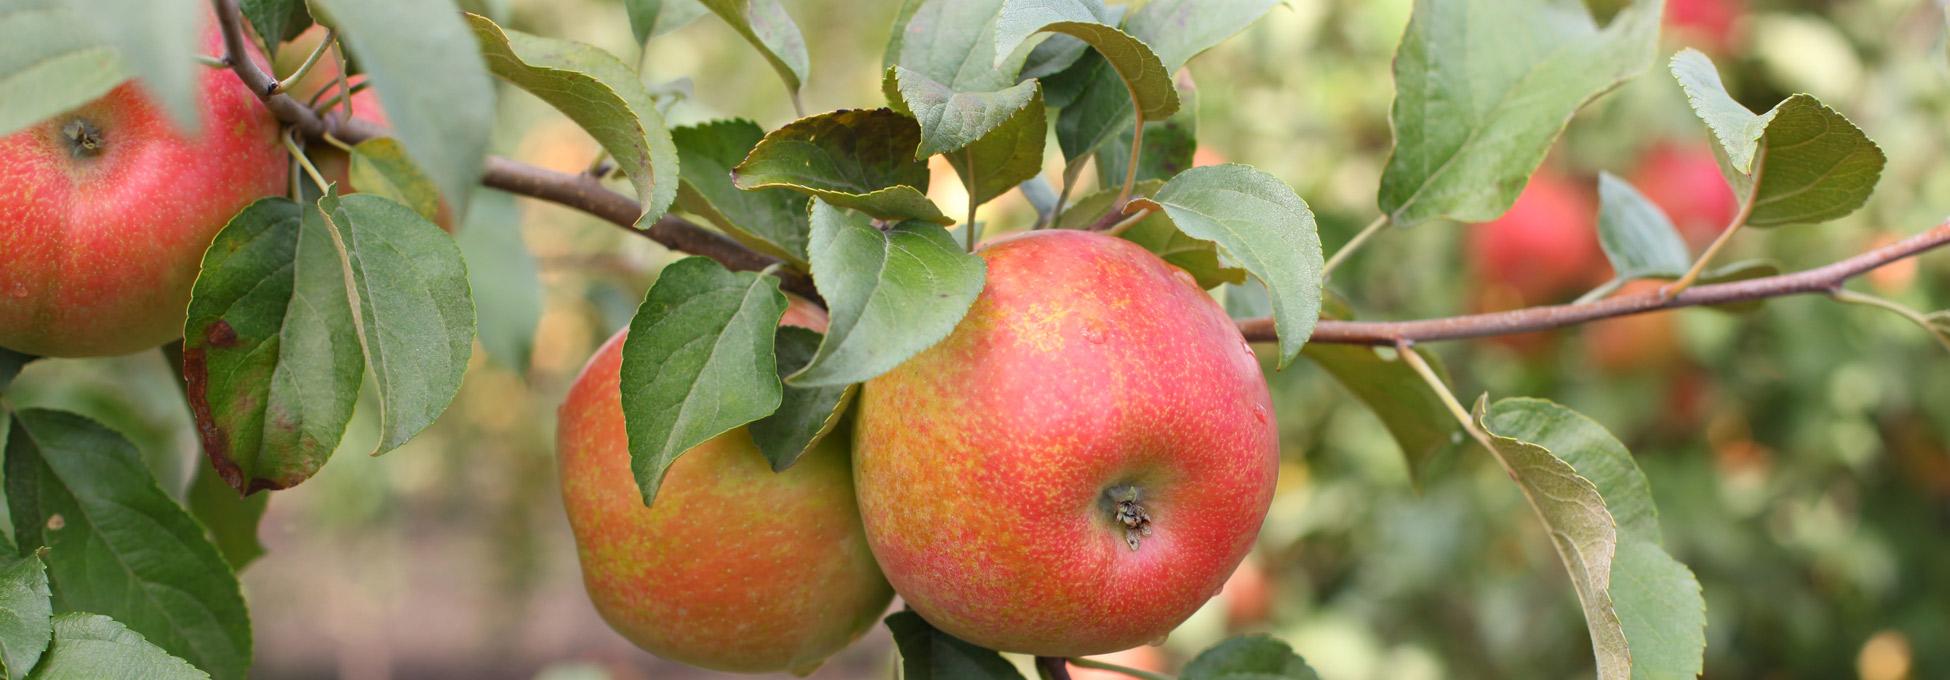 trigs-homepg-honeycrisp-apples-2.jpg